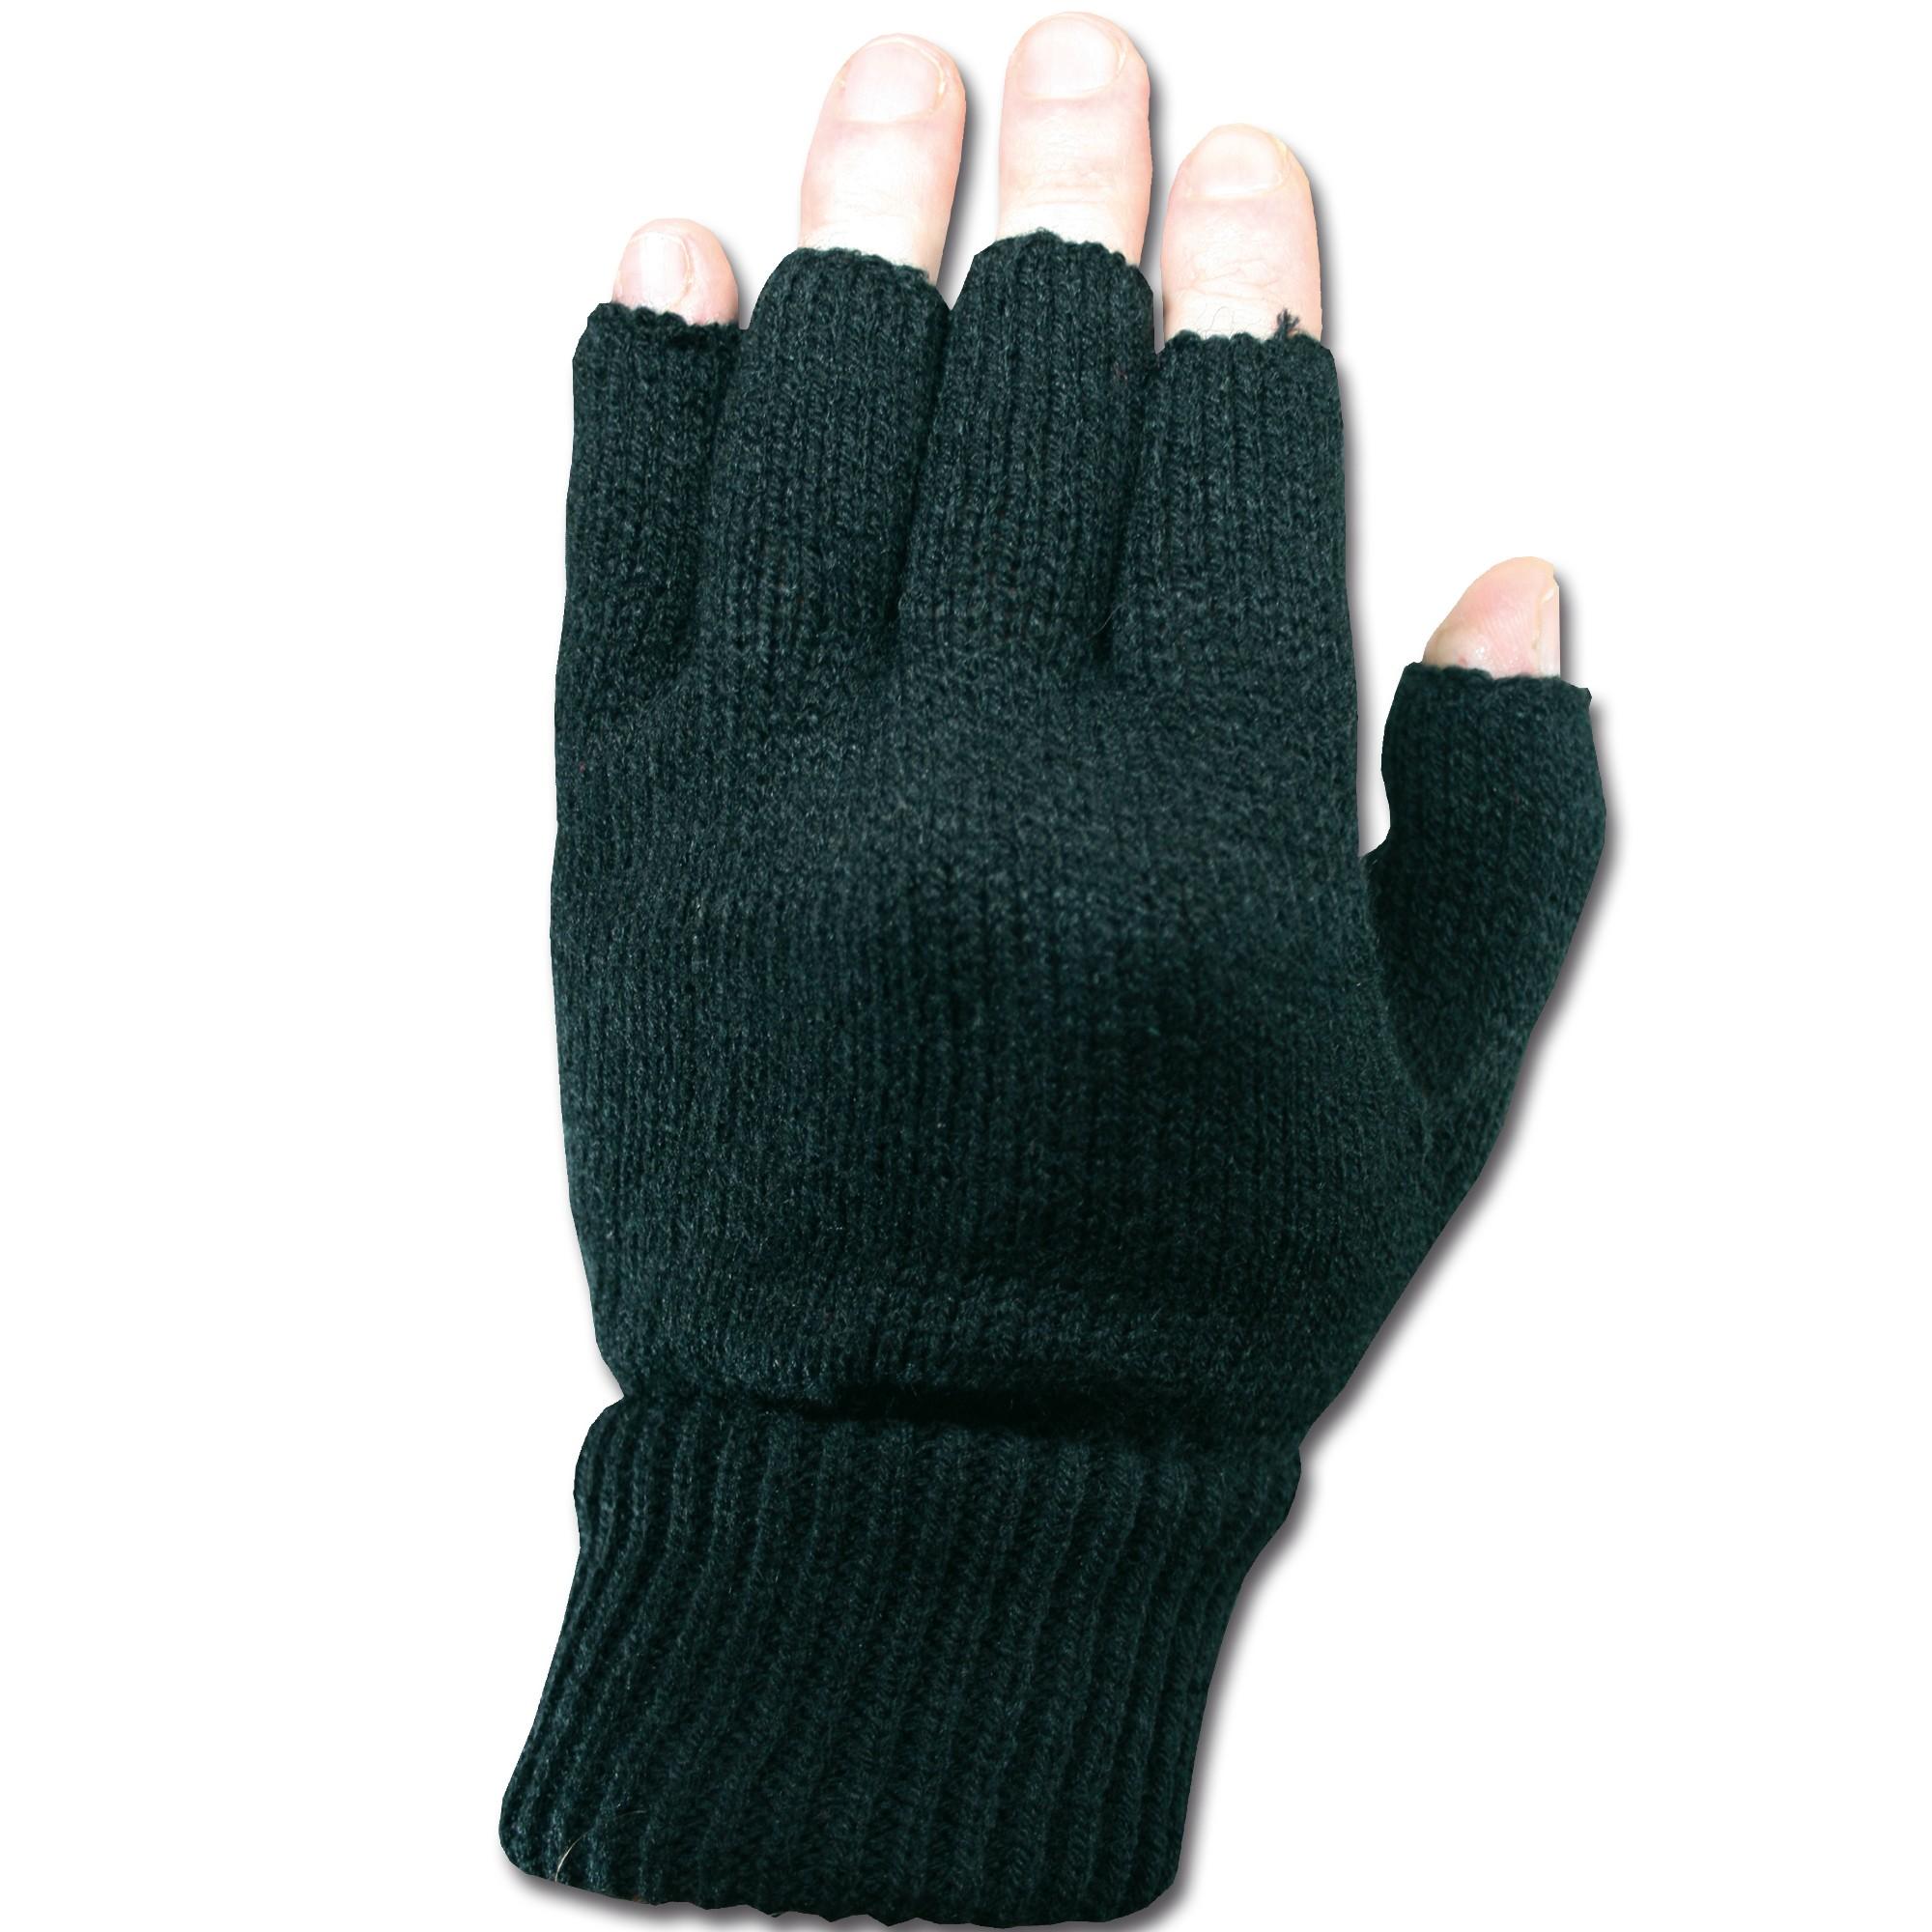 Fingerlinge Acryl schwarz